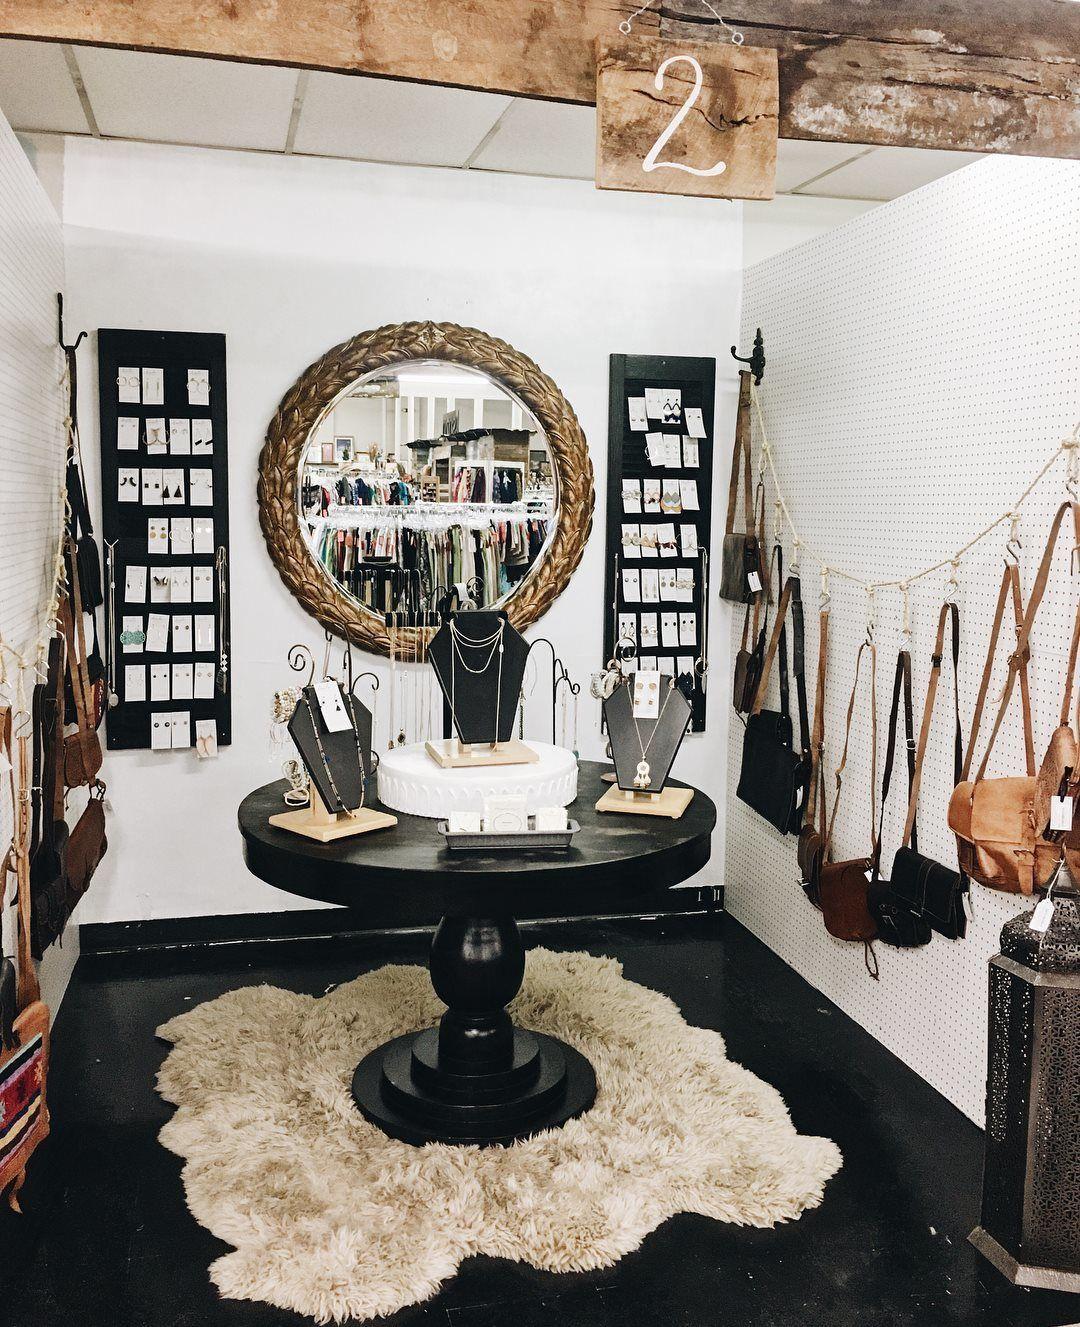 Avondale Birmingham Al: Your Ultimate Guide To Avondale, The 'Ham's' Hippest Haven